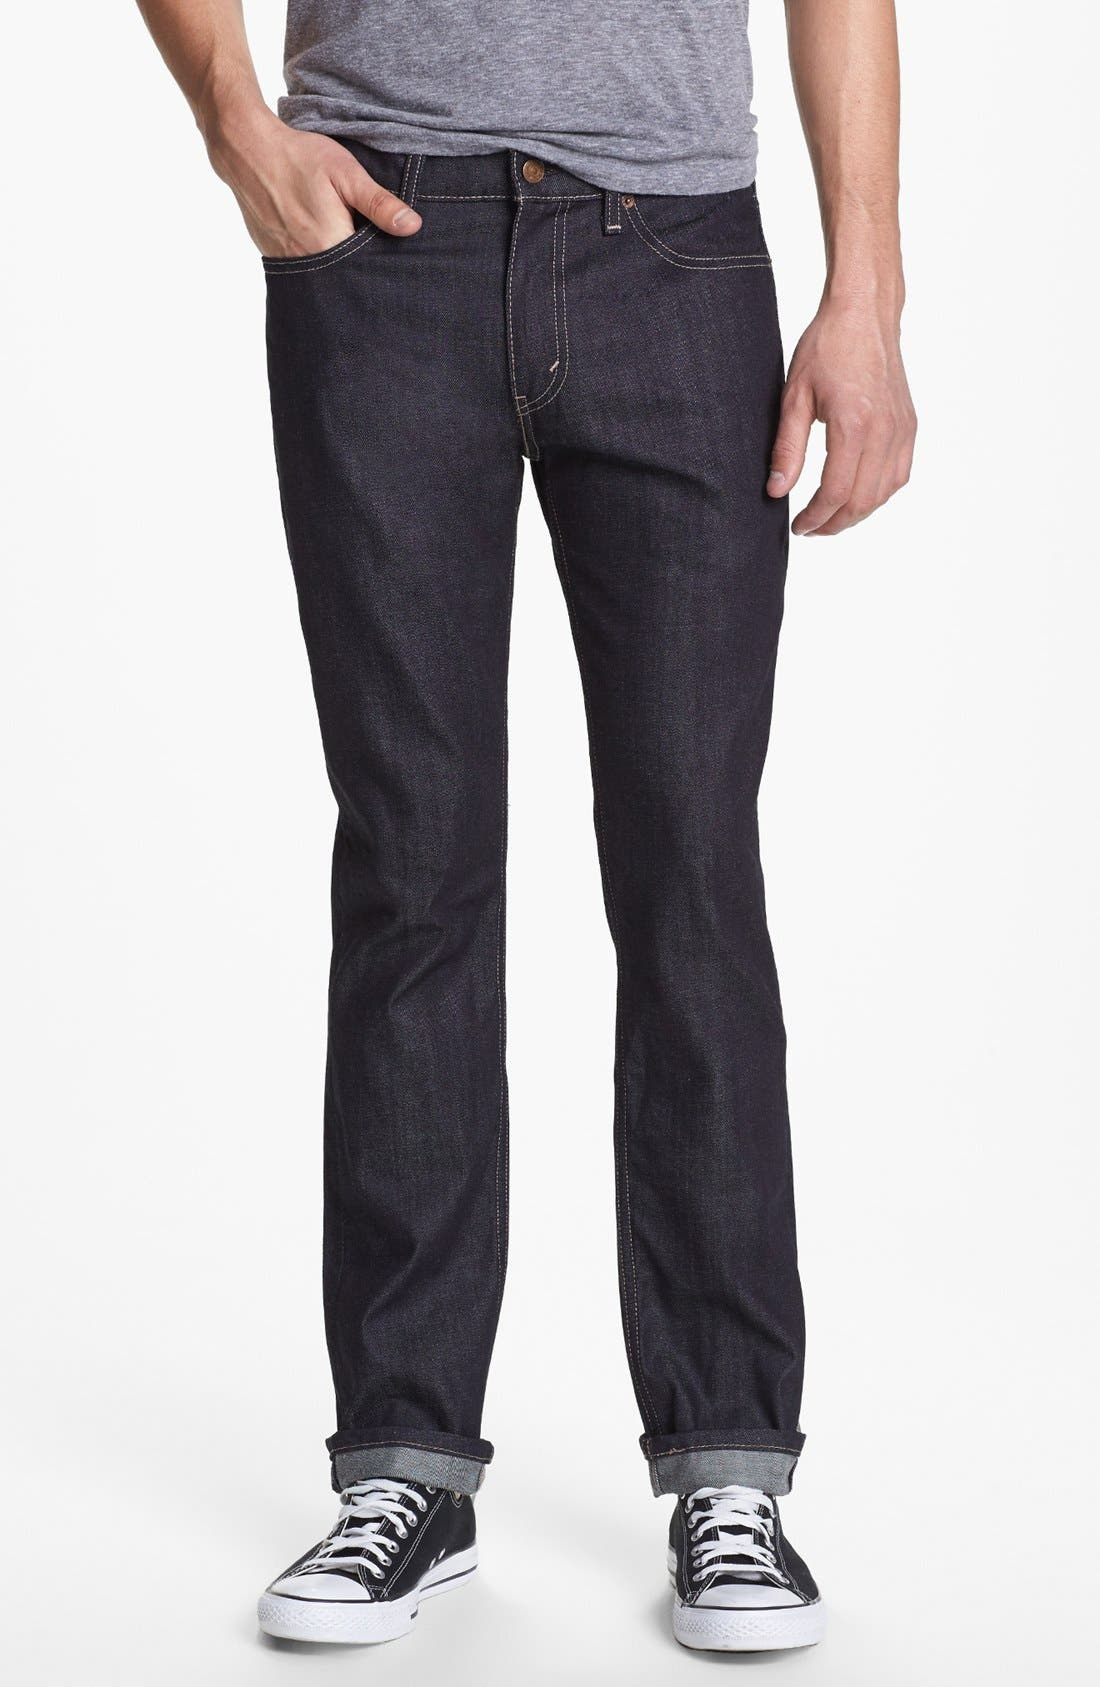 Alternate Image 1 Selected - Levi's® '511™' Slim Fit Jeans (Rigid Dragon)